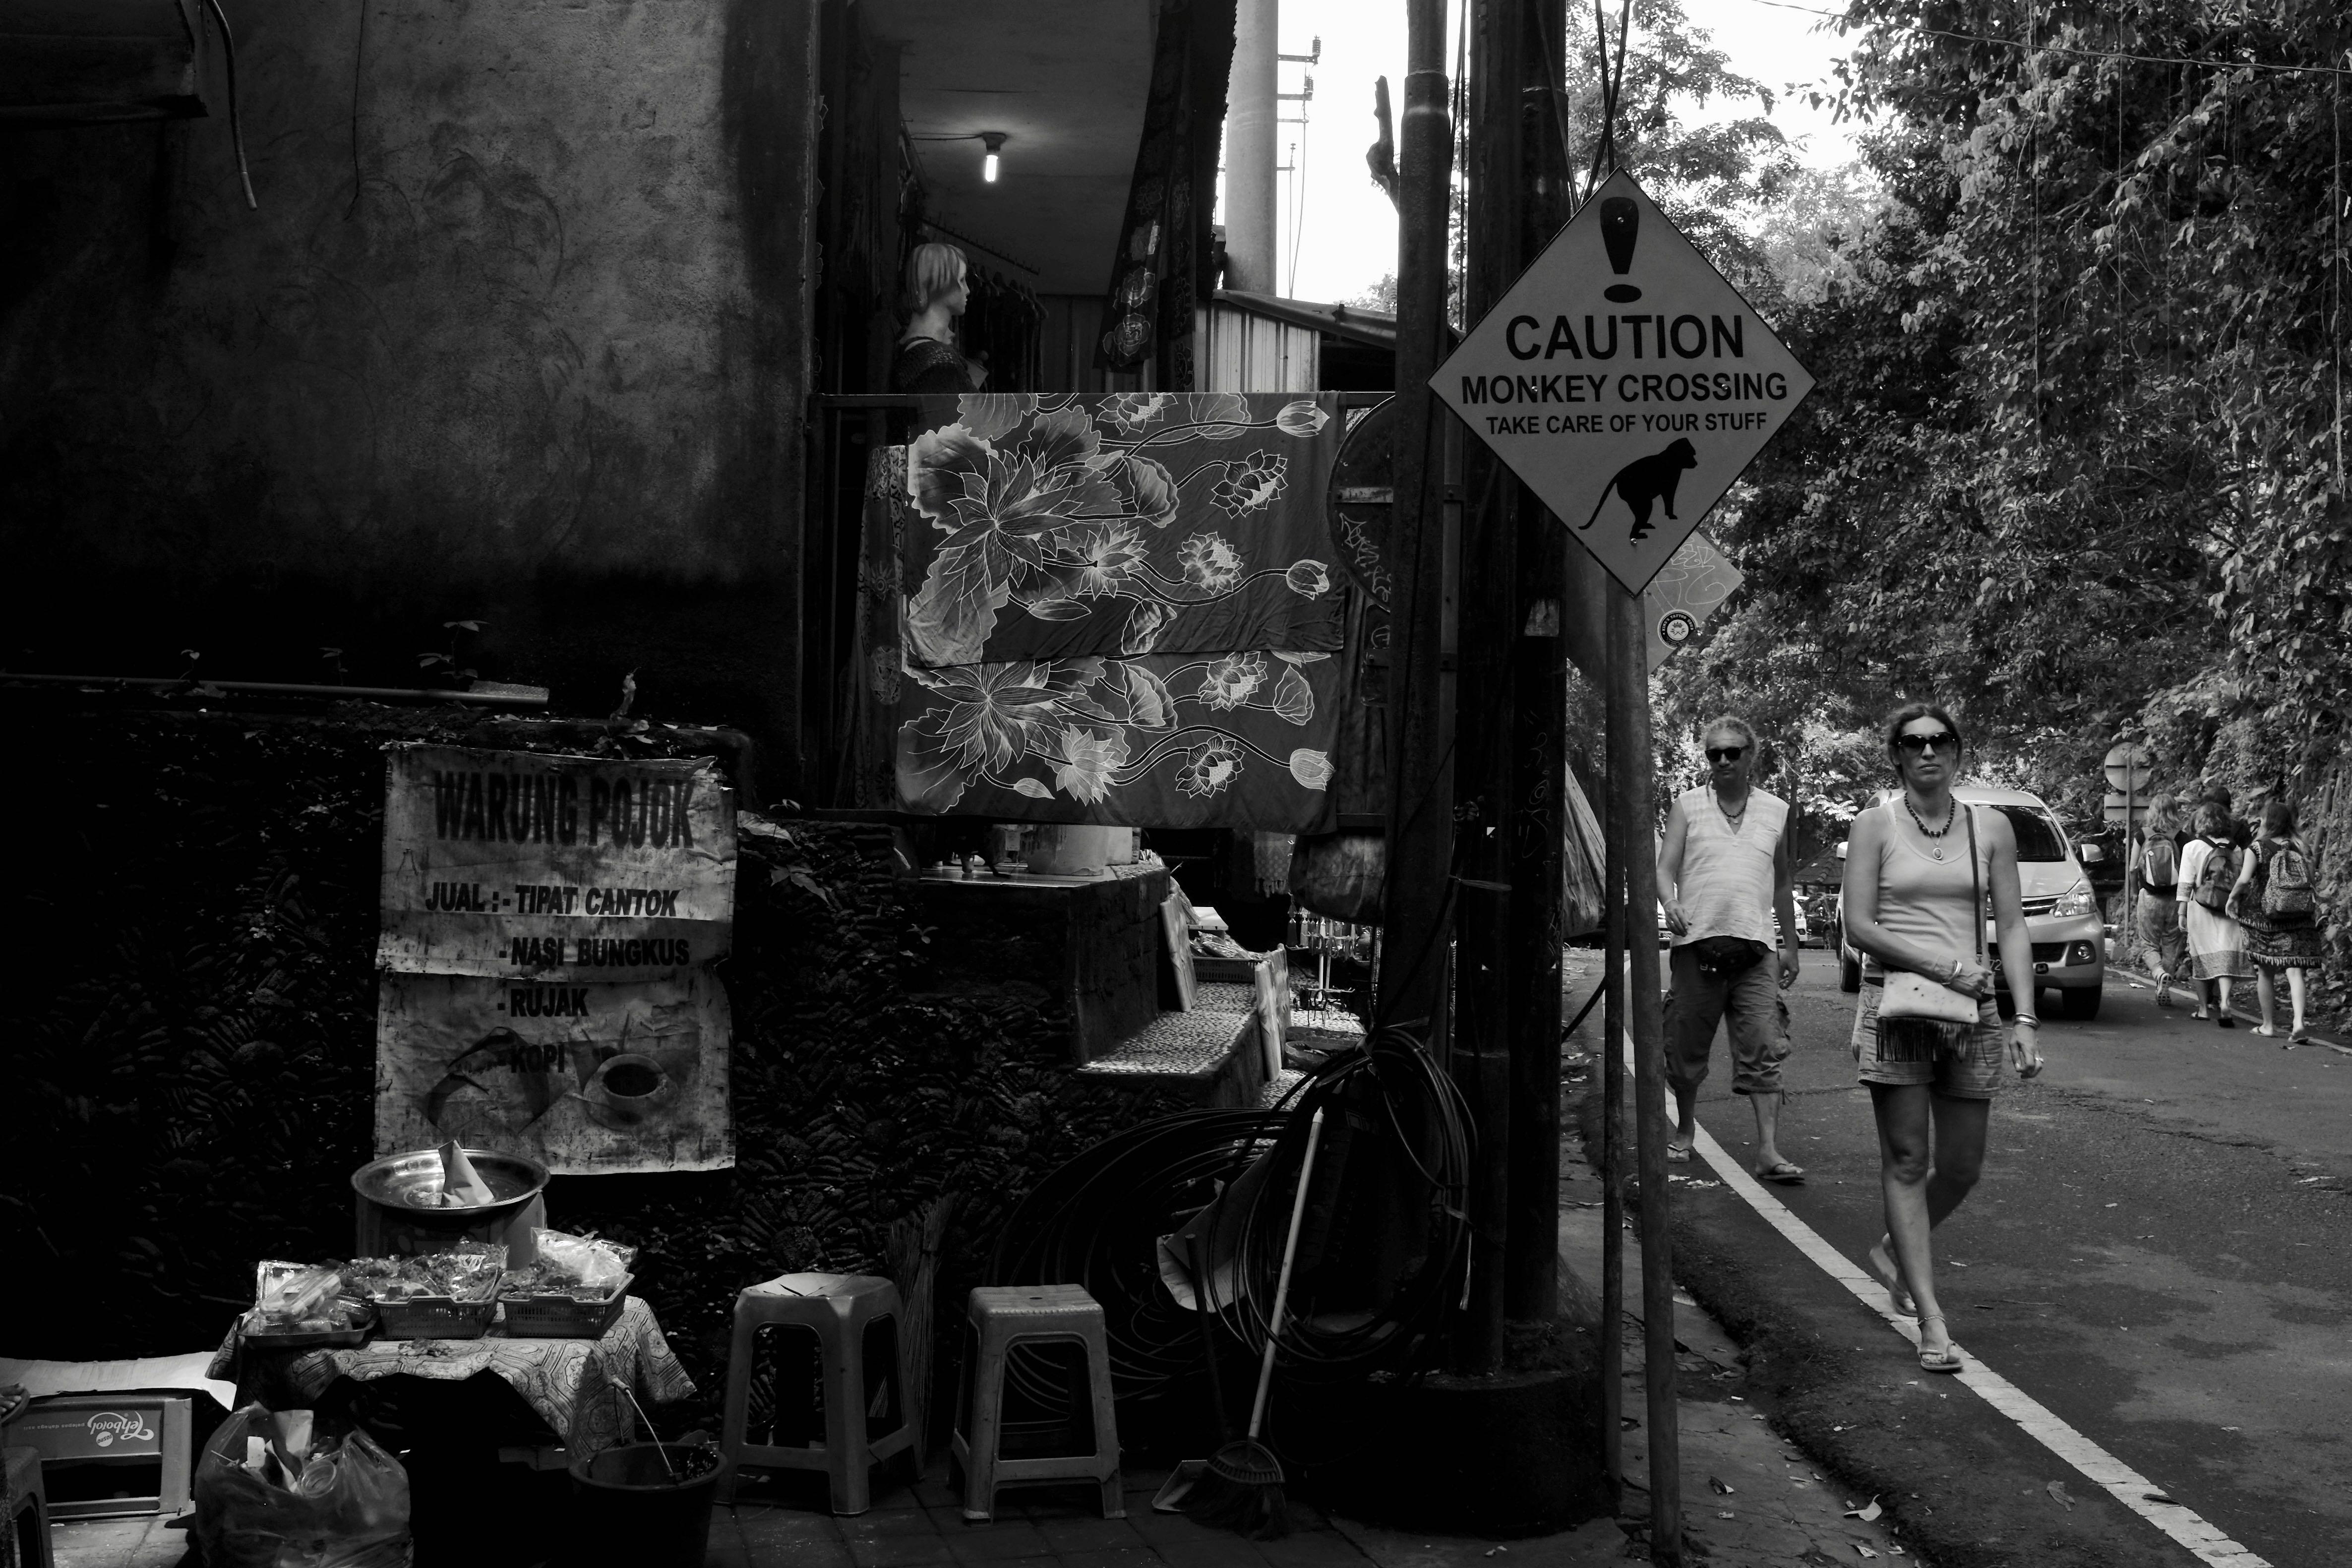 Sacred Monkey Forest - Bali Street Photographer